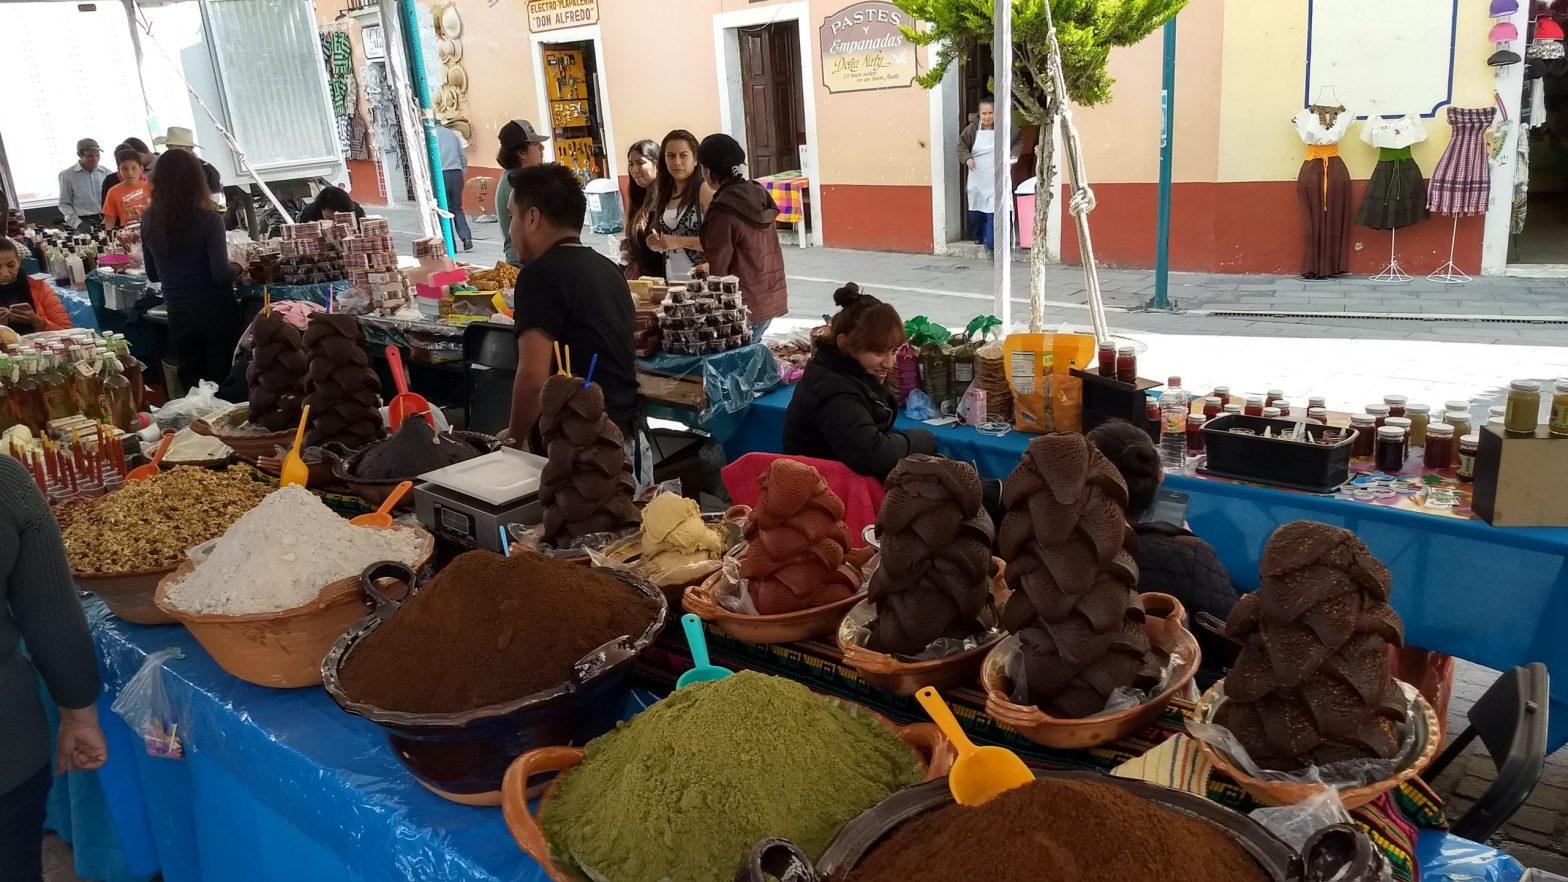 Street vendor at Real del Monte